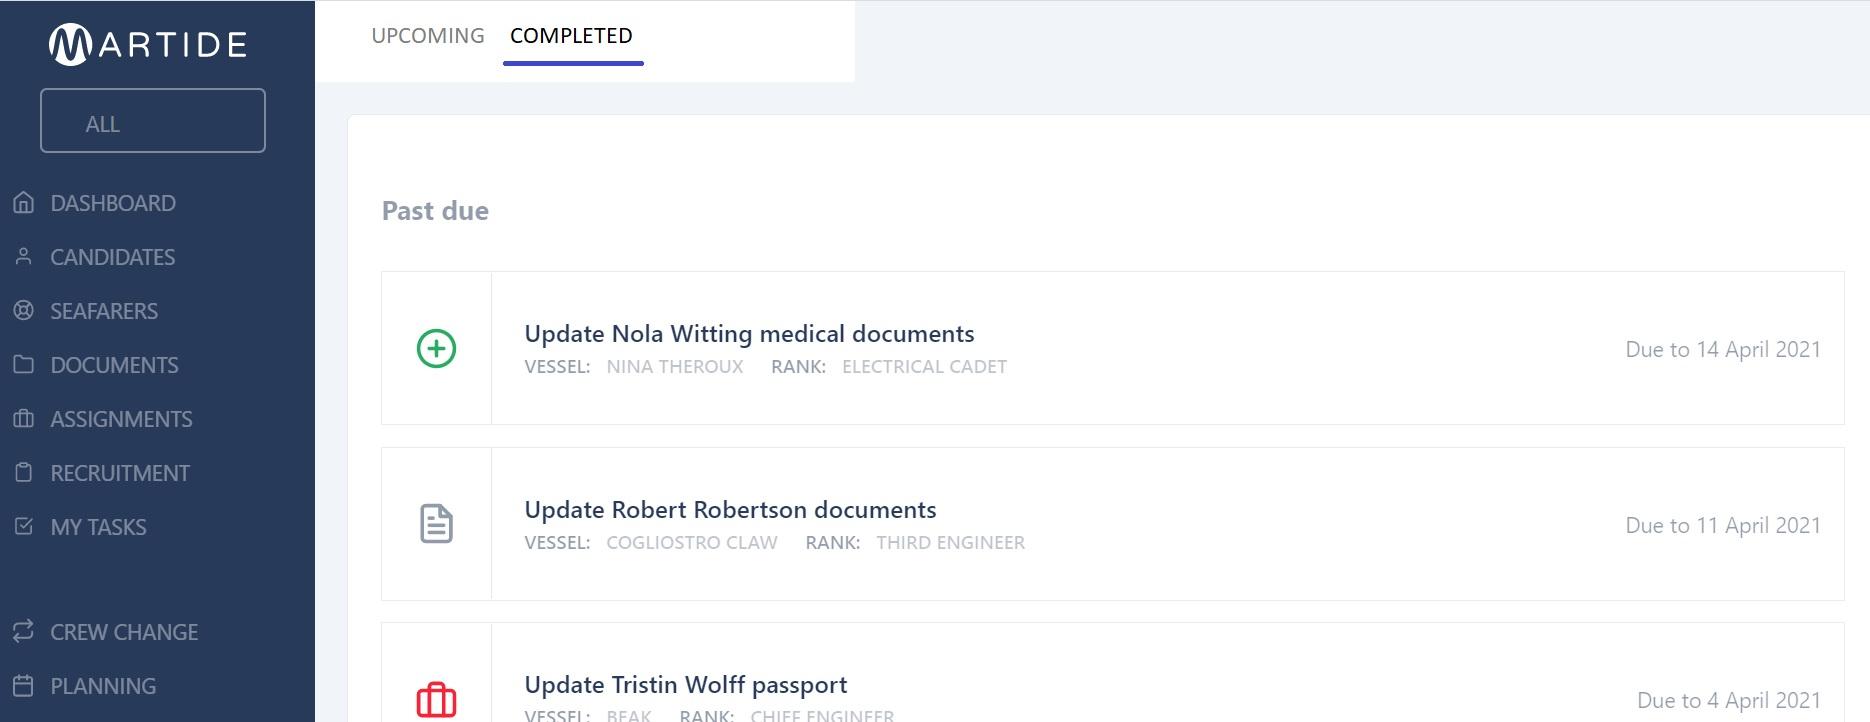 screenshot of Martide's maritime recruitment website showing the complete tasks